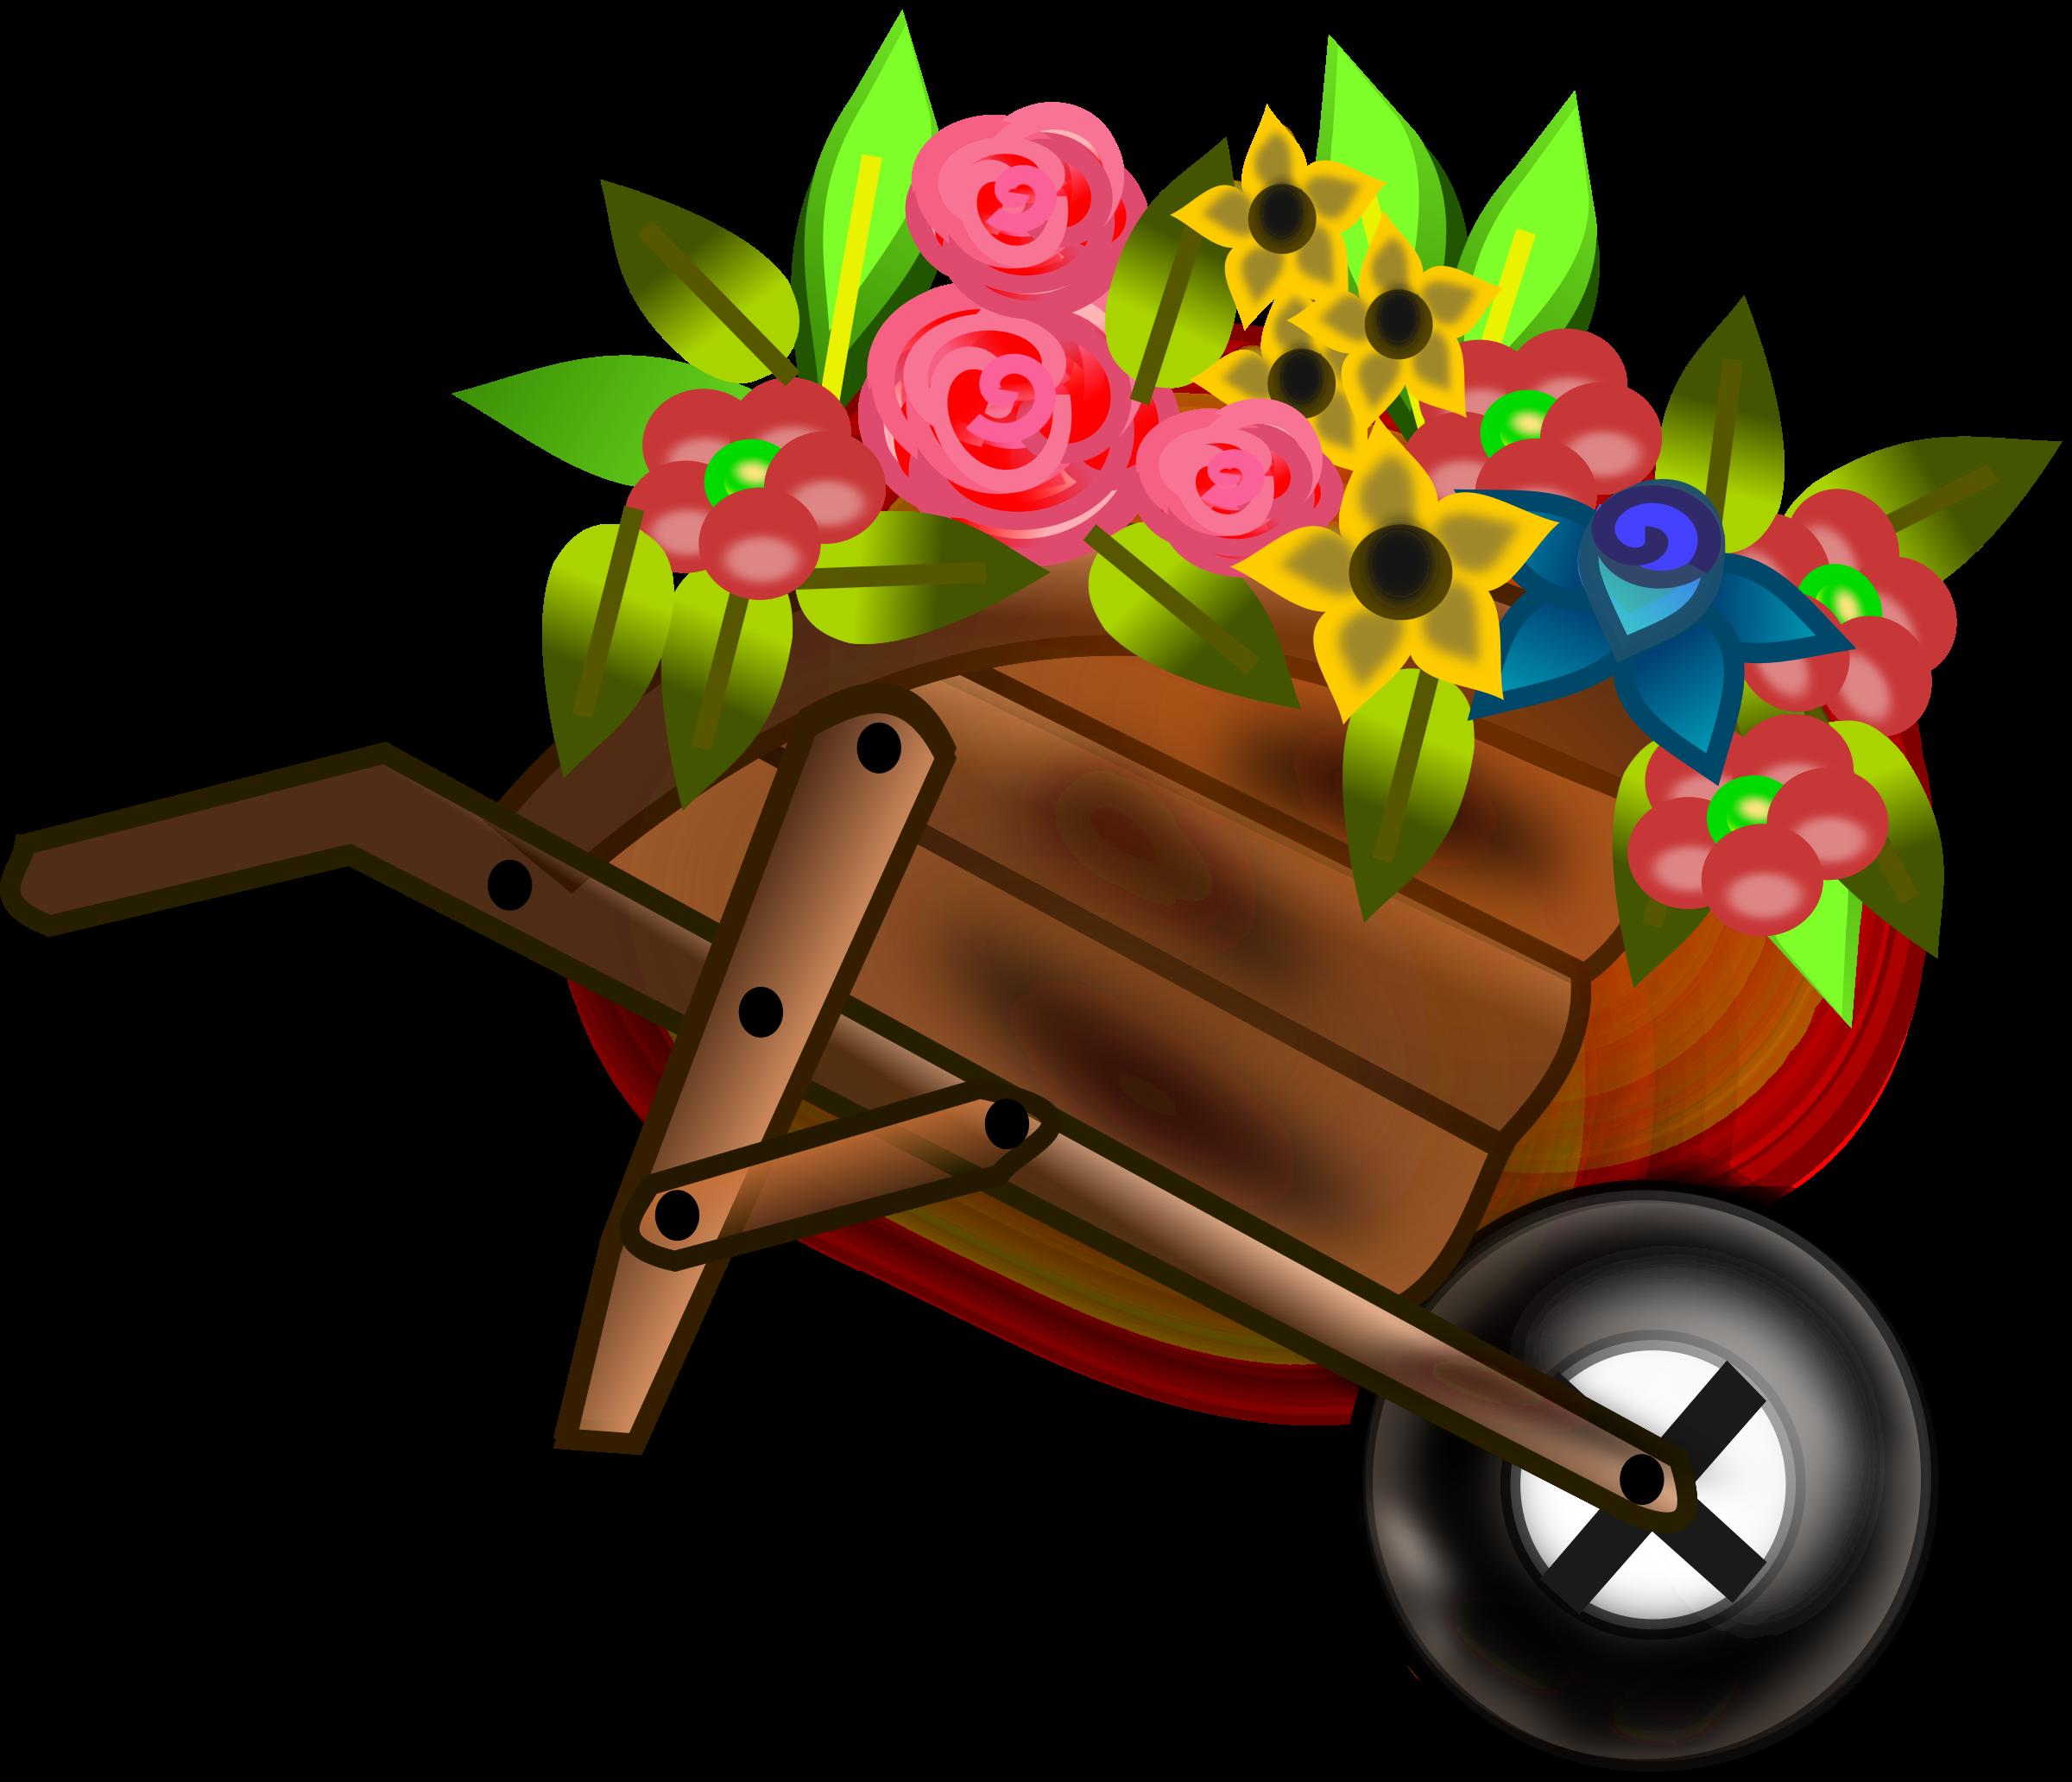 Flower girl big image. Wheel clipart brown